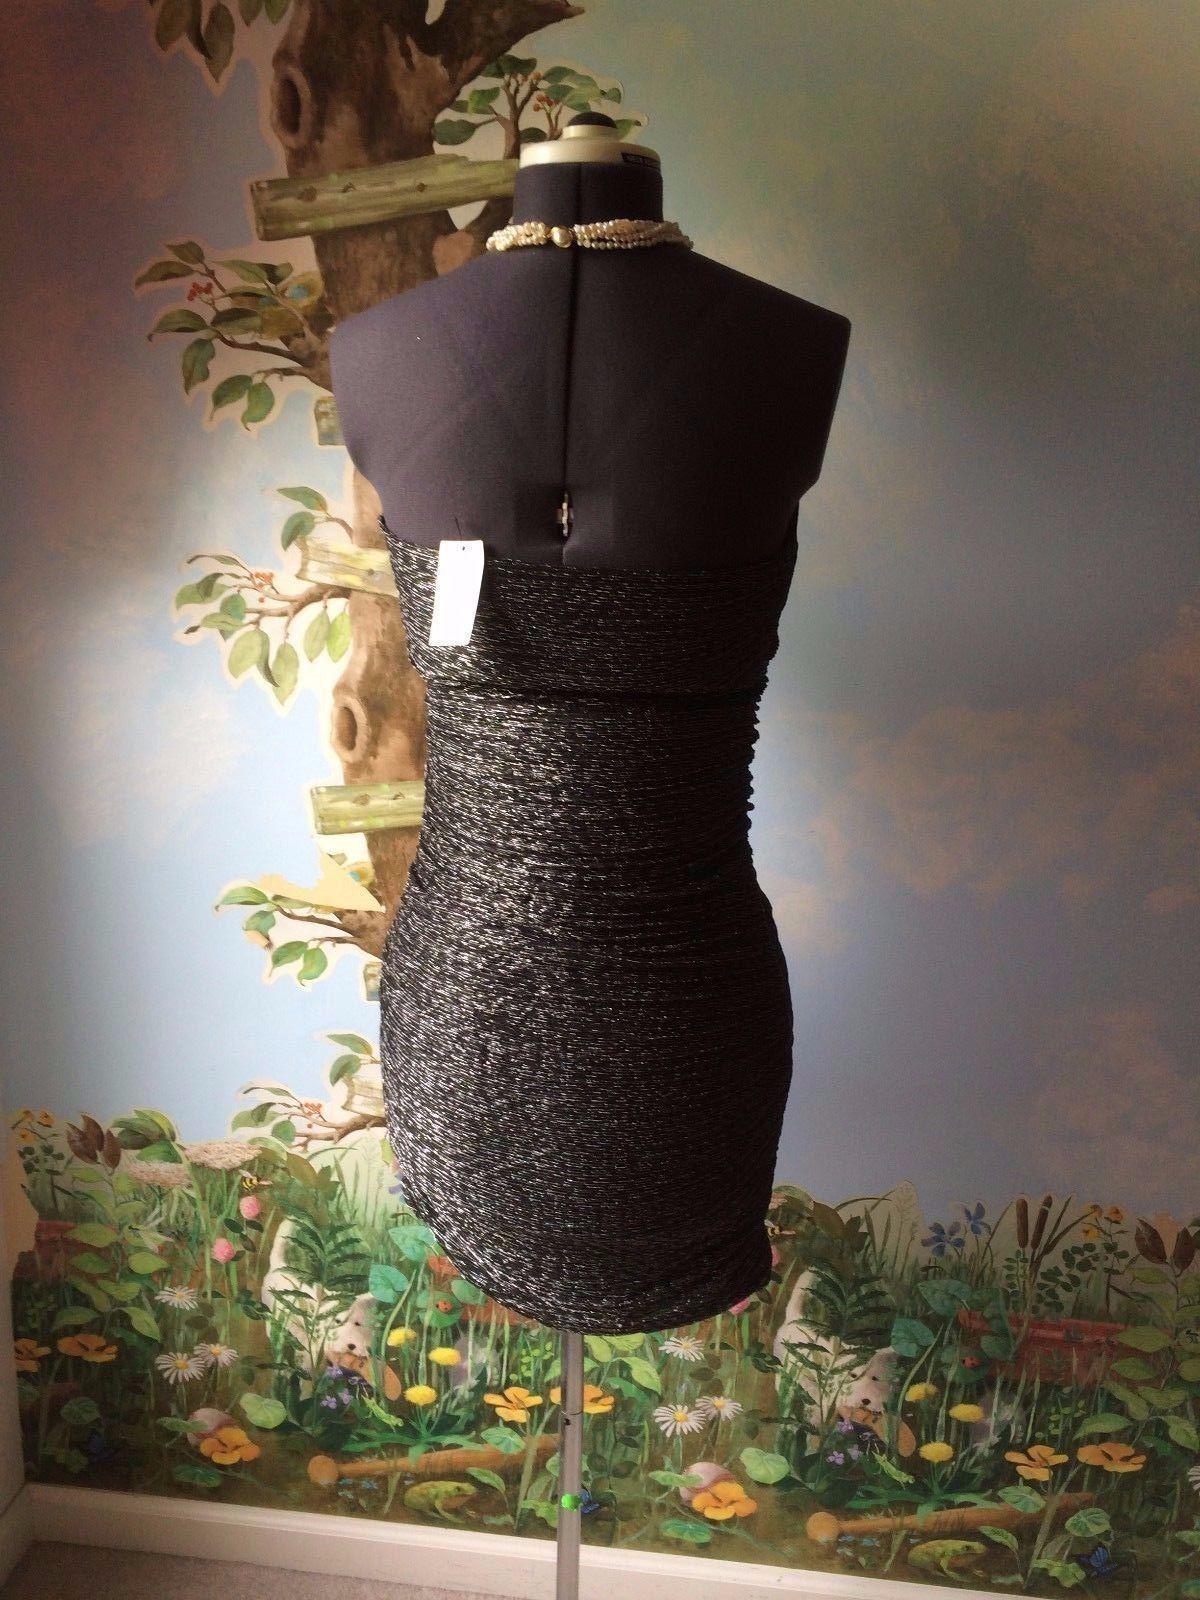 Express Women's Black & Silver Strapless Cocktail Dress SZ M NWT image 5